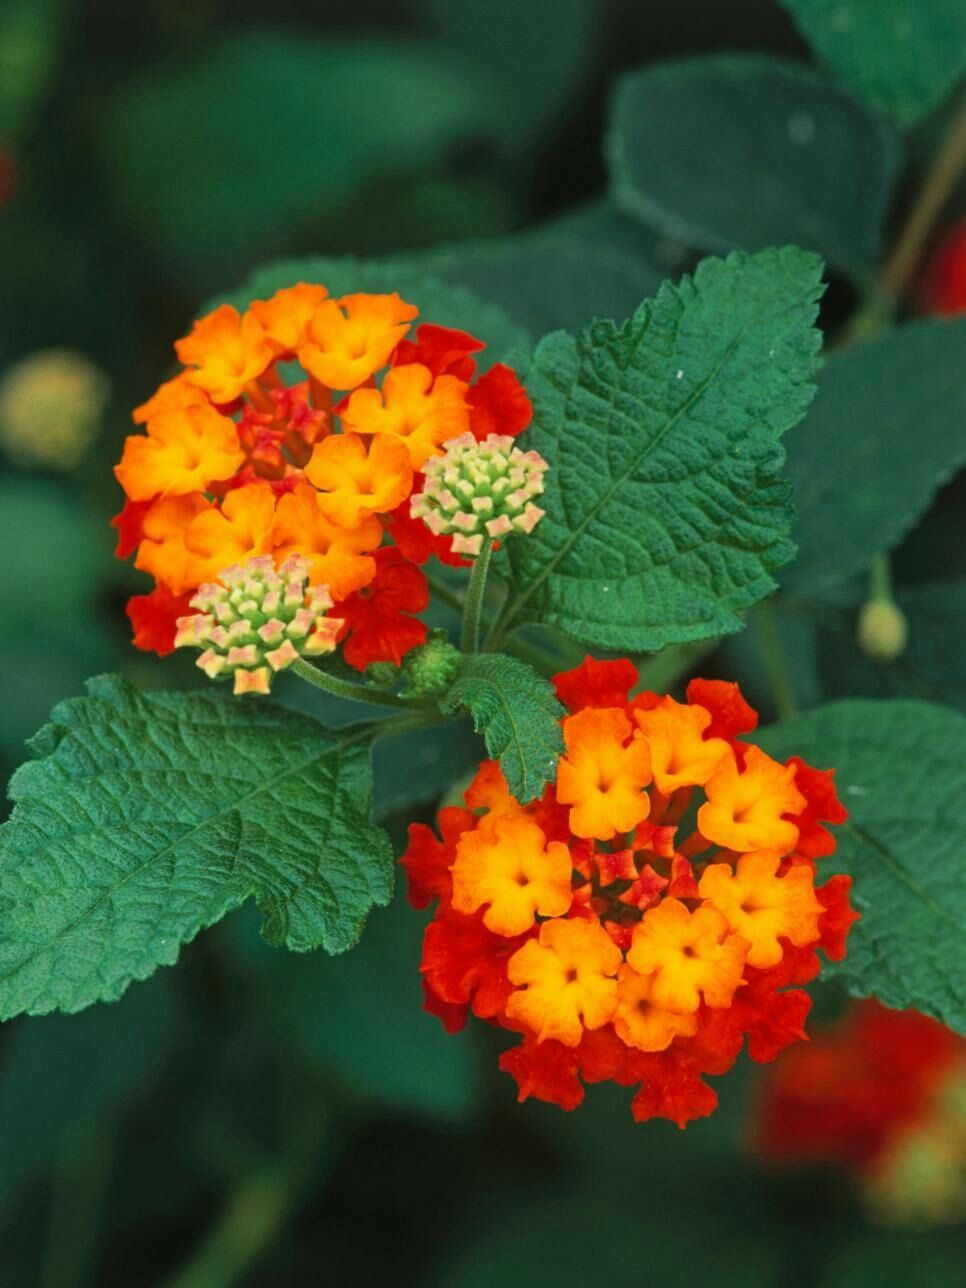 Pin De Perrinenicole Em Fleurs Plantas Jardim Plantas Pancs